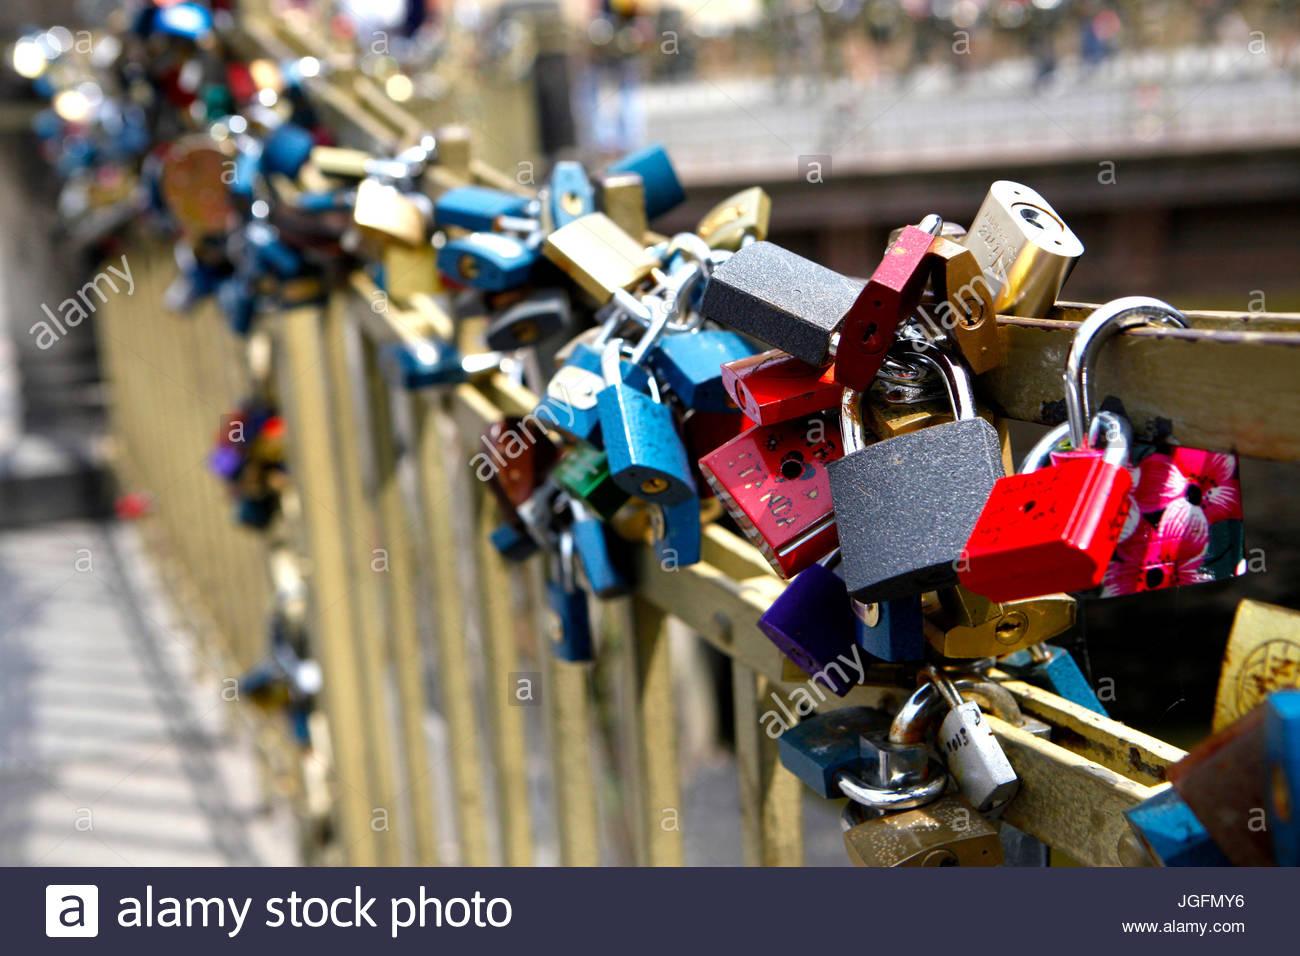 Padlocks have attached to a bridge near the Charles Bridge symbolize love. - Stock Image